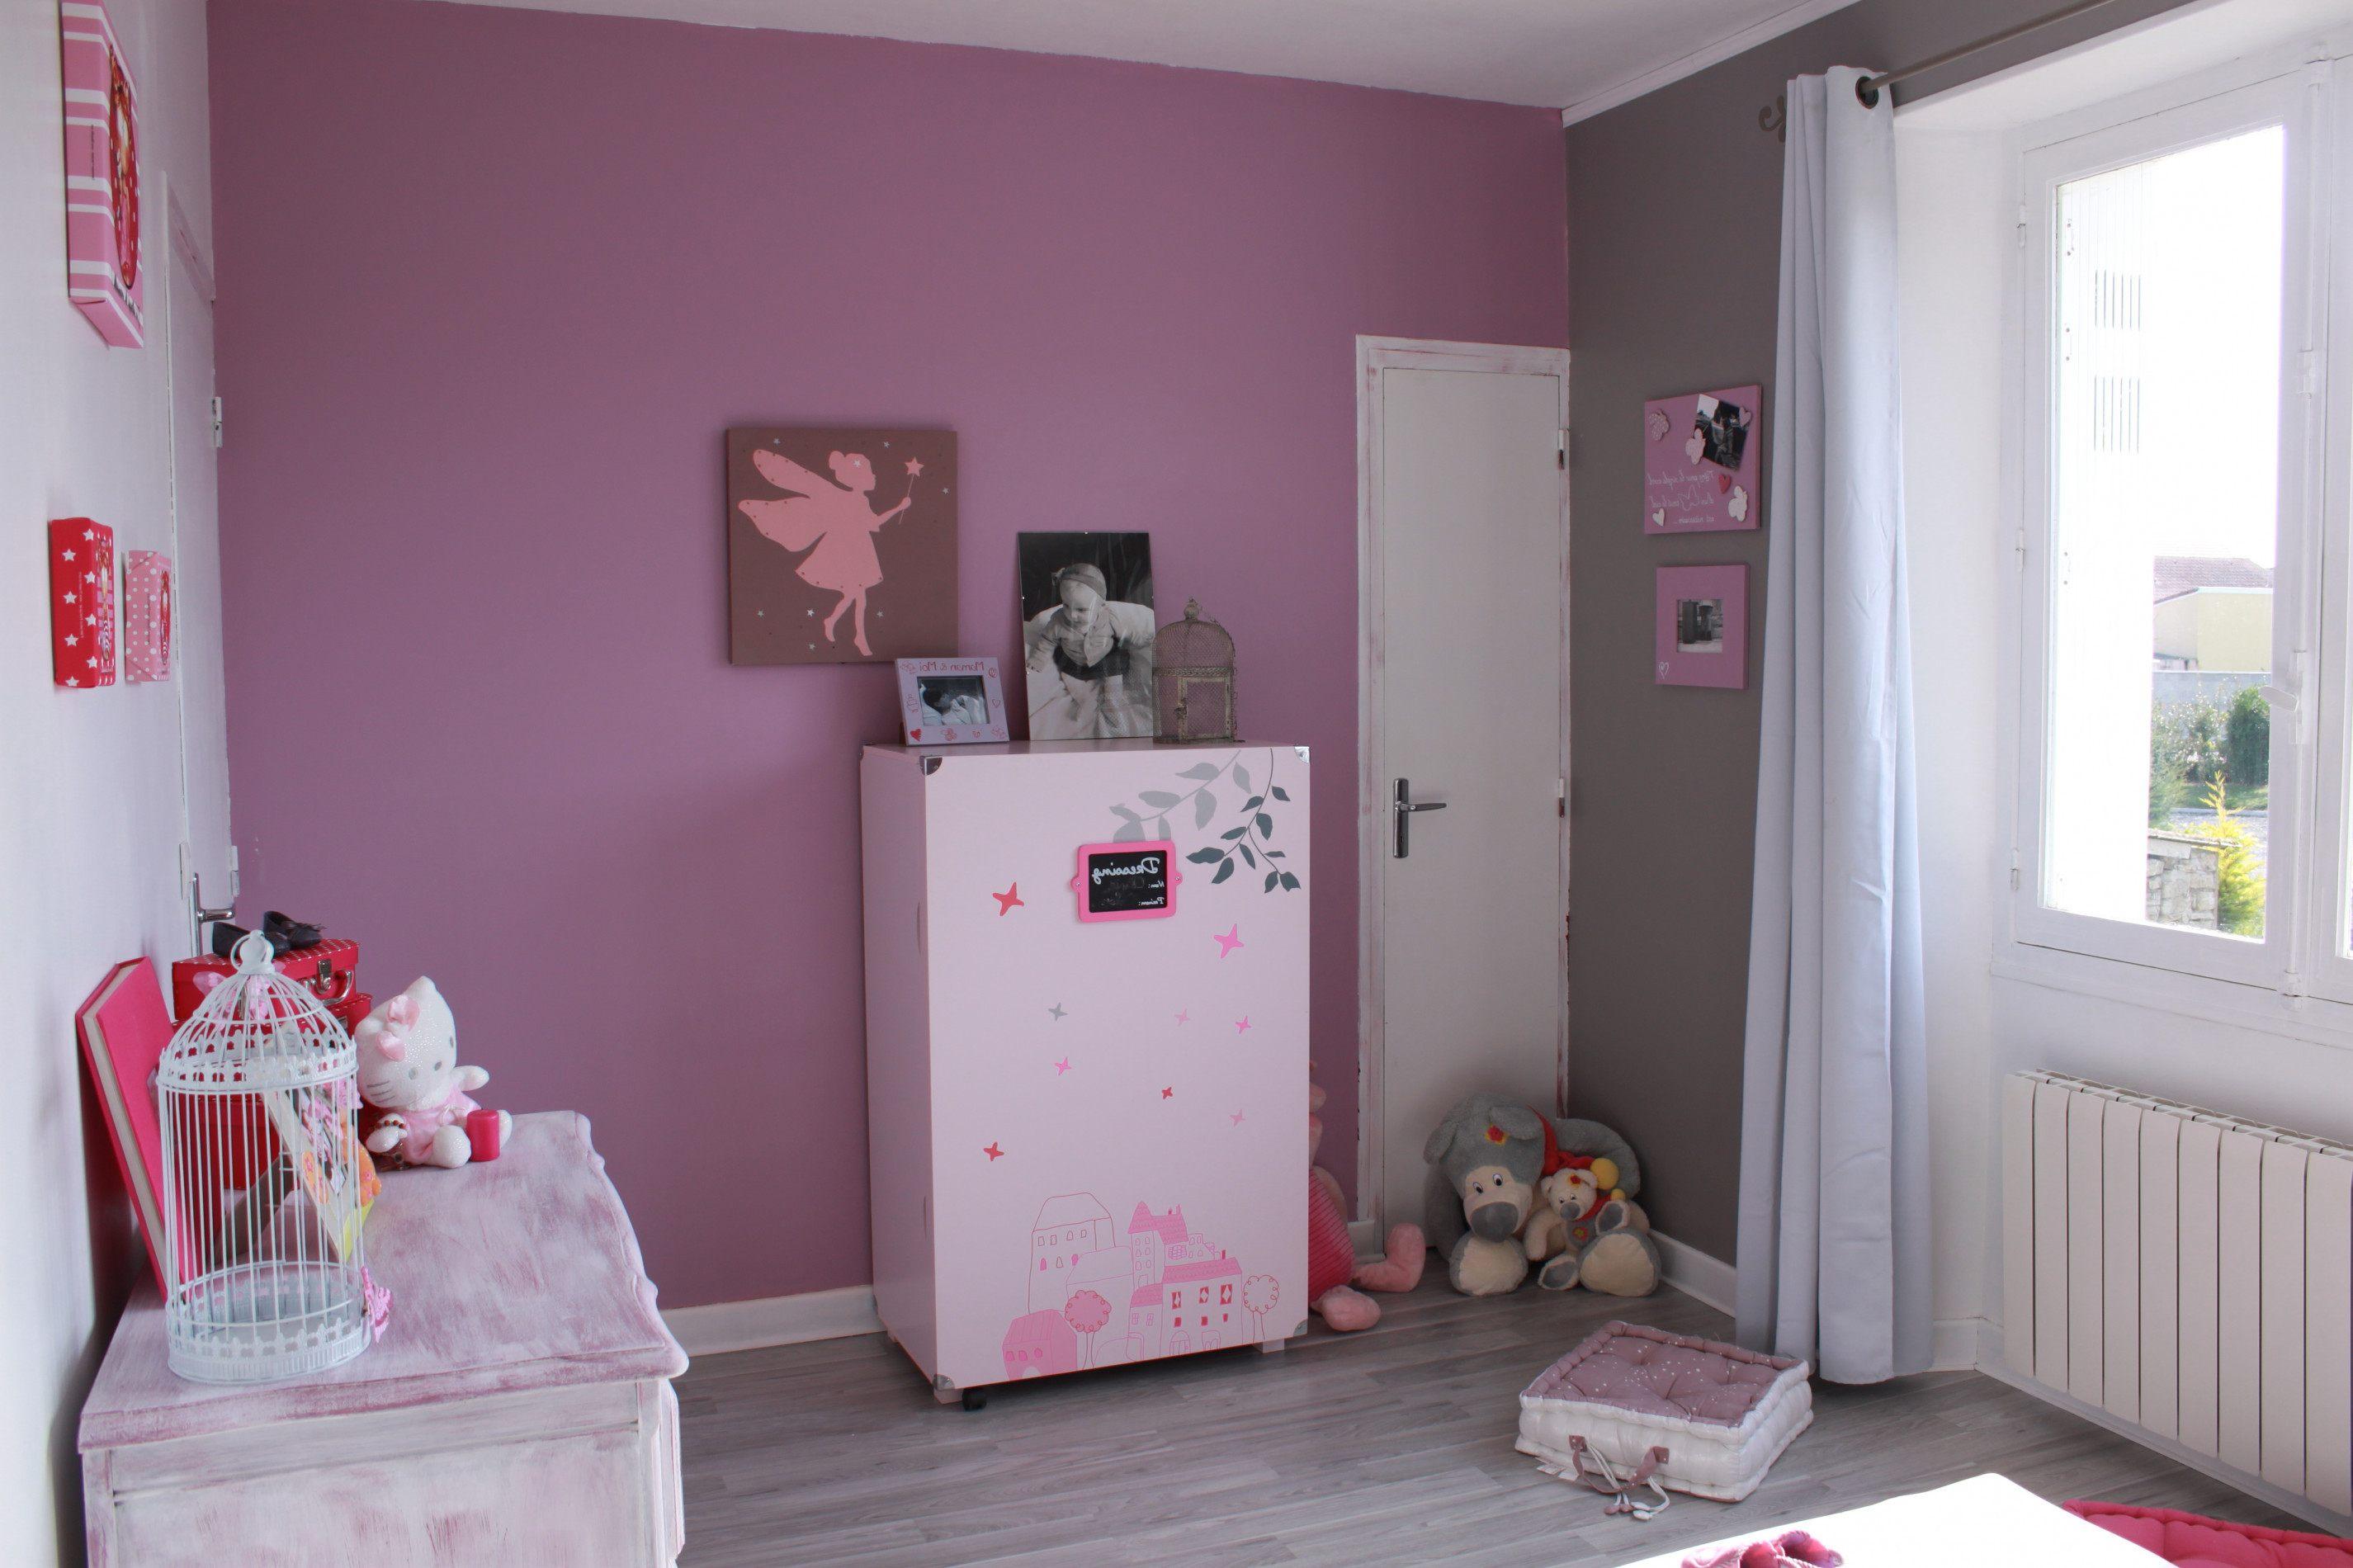 Lit Bebe Taupe Le Luxe Glamour Chambre Enfant Vintage Et Chambre Bebe Plete Lovely Bebe